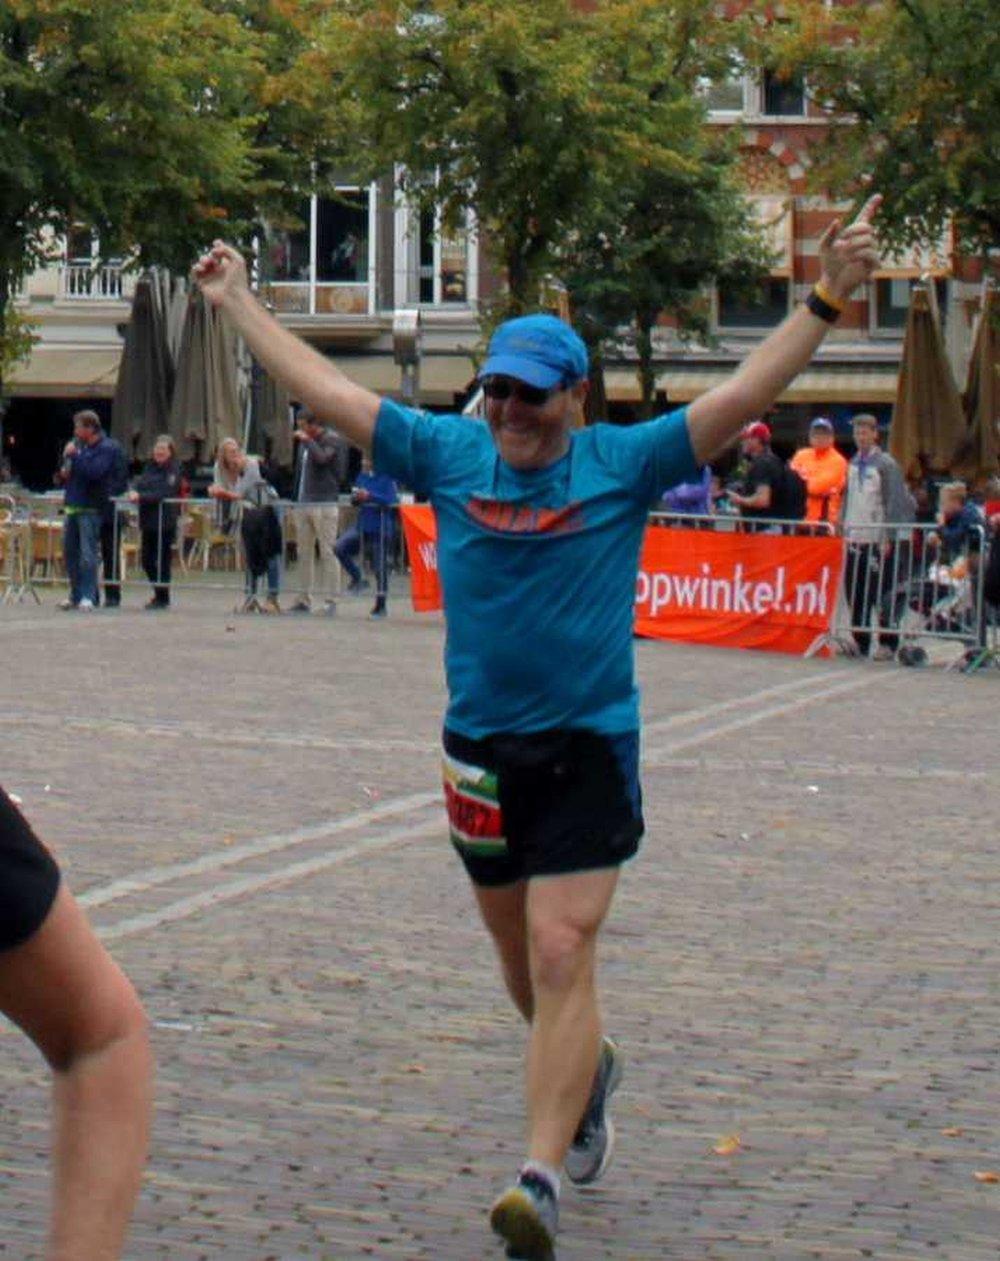 Den Haag Half Marathon, September 2015